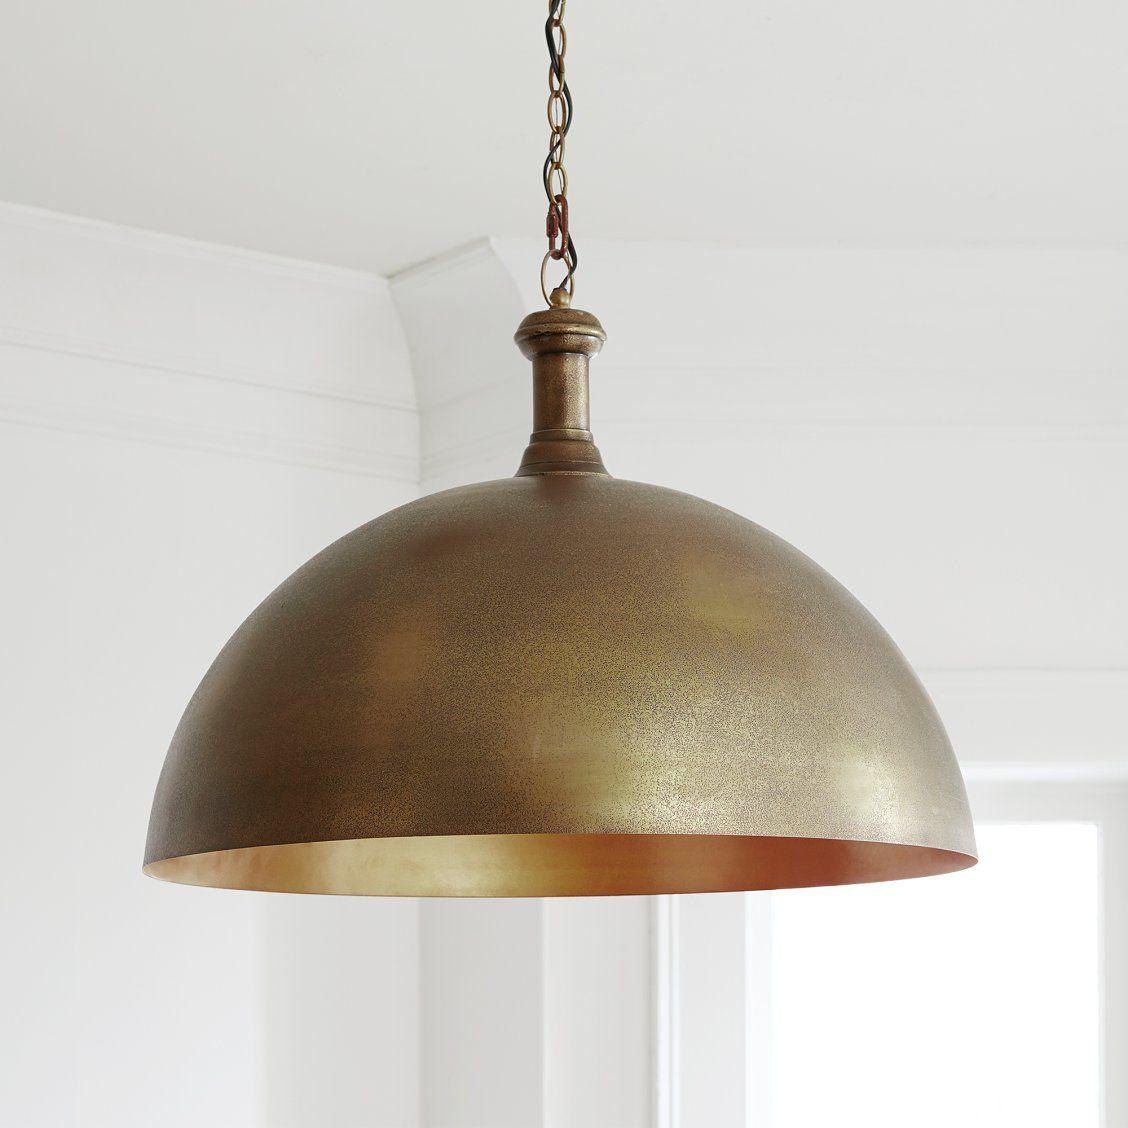 Bohdi Brass Dome Pendant Light Dome Pendant Lighting Brass Dome Pendant Light Pendant Light Kitchen dome ceiling lighting